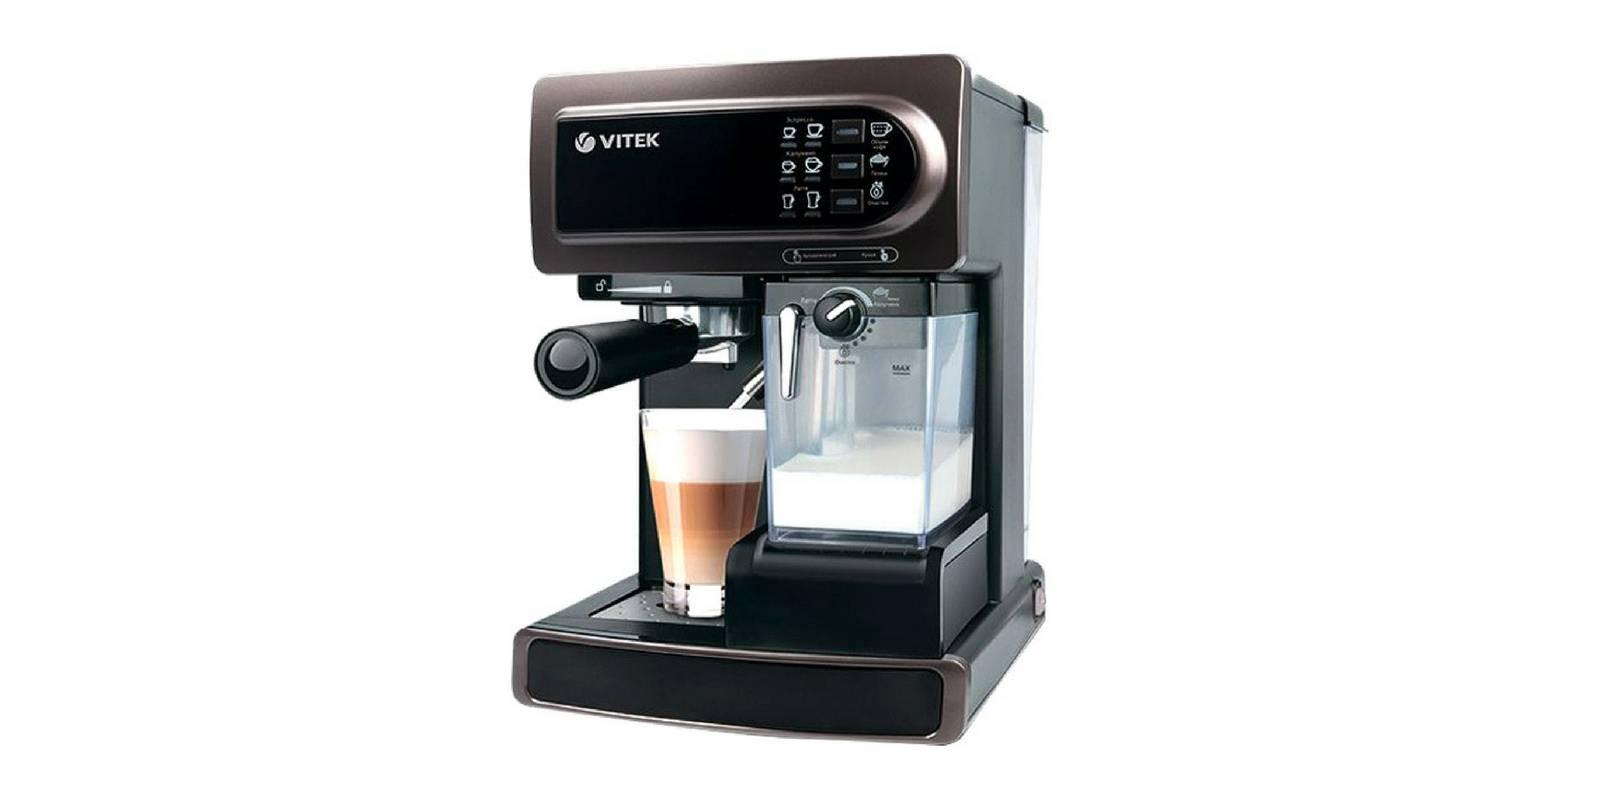 Лучшие кофеварки vitek рожкового типа